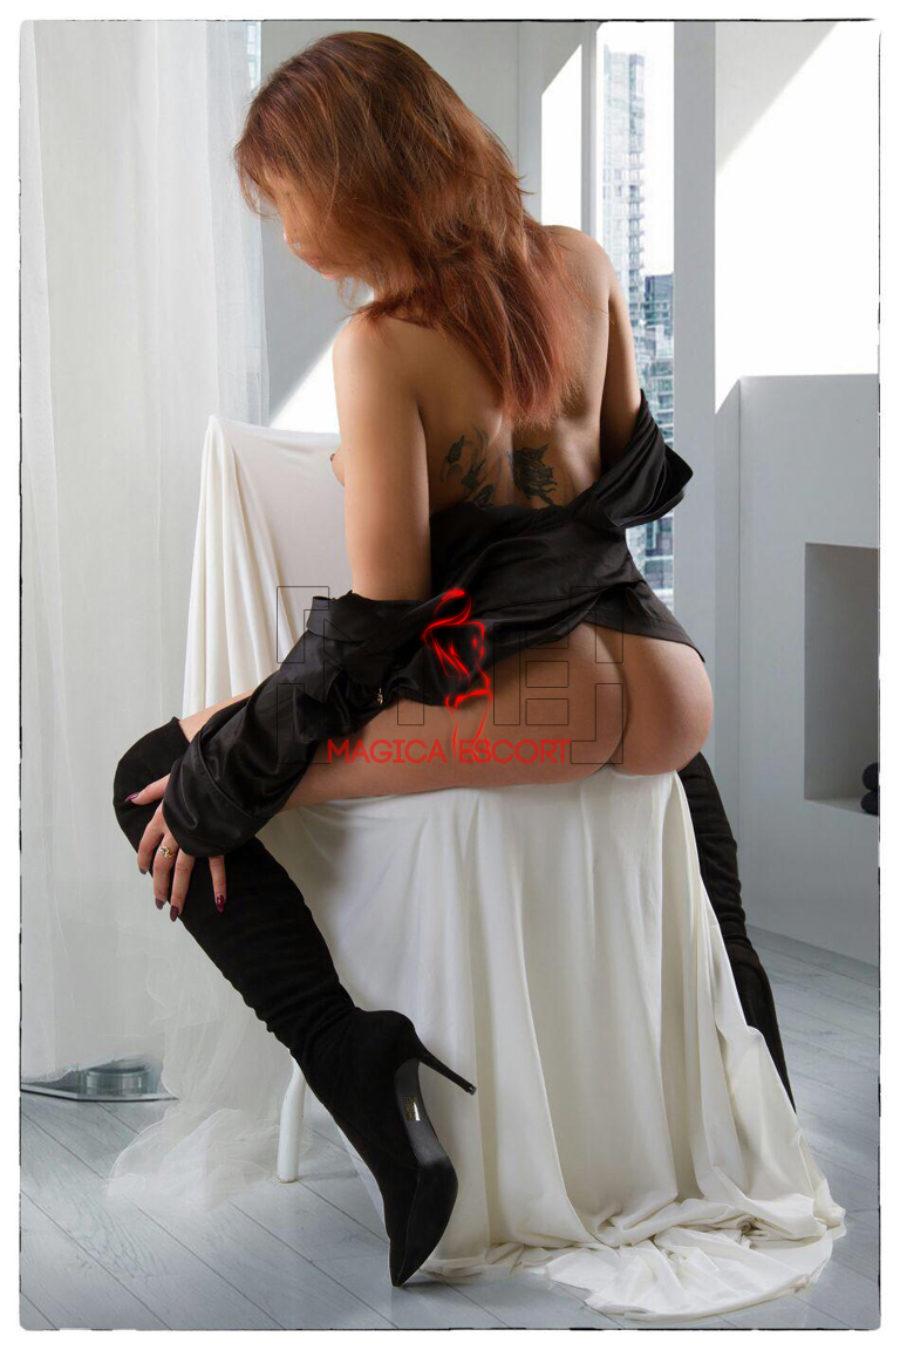 Emeshe escort high class è seduta in una sedia senza indossare le mutandine.